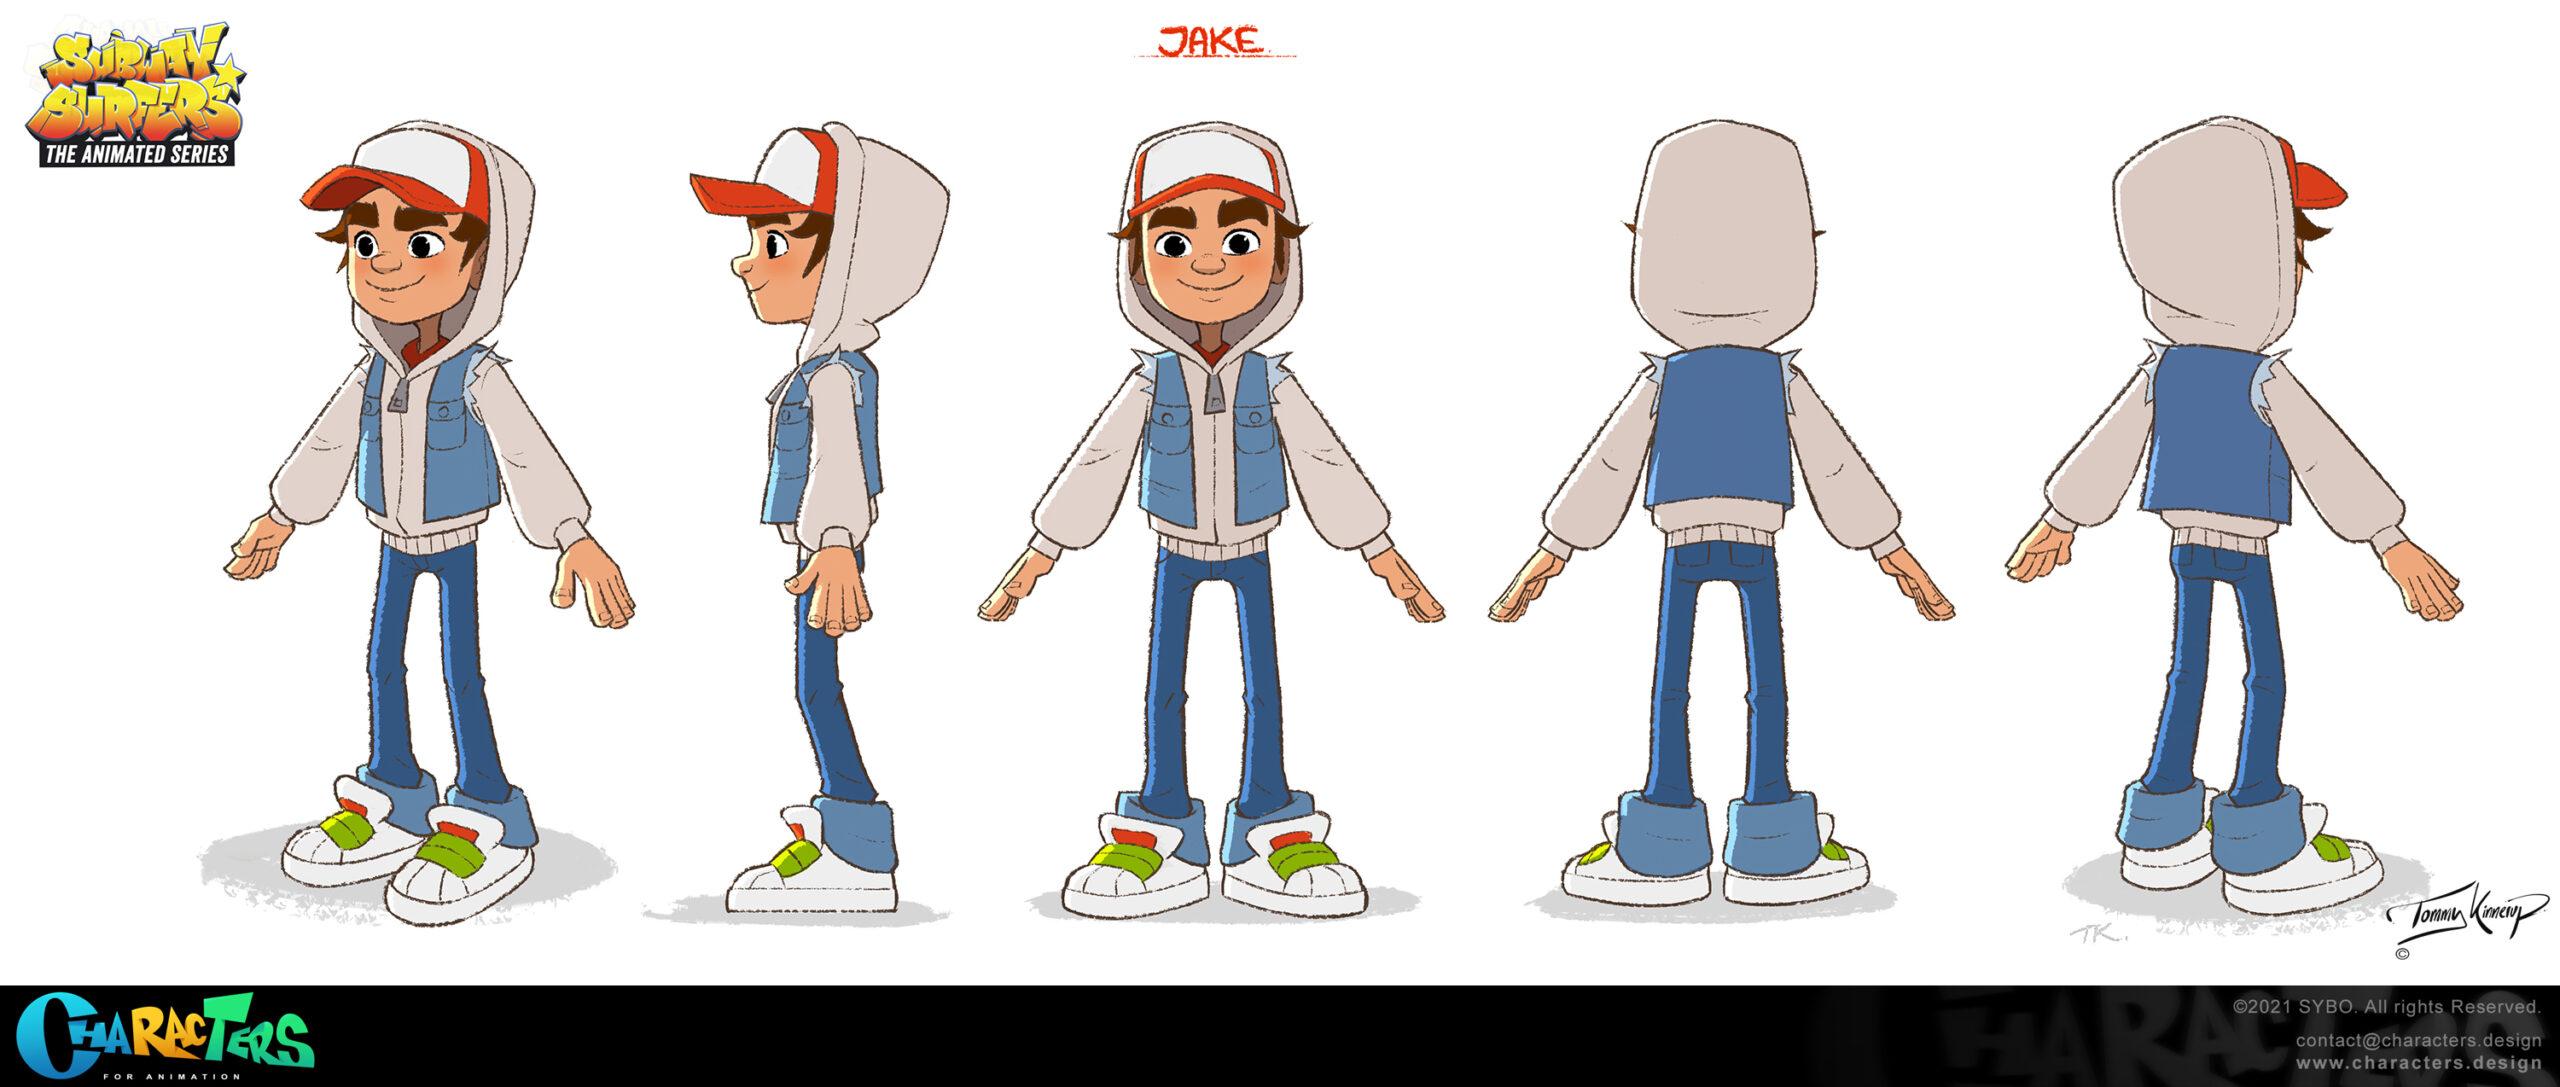 Characters_characterdesign_TK_v05